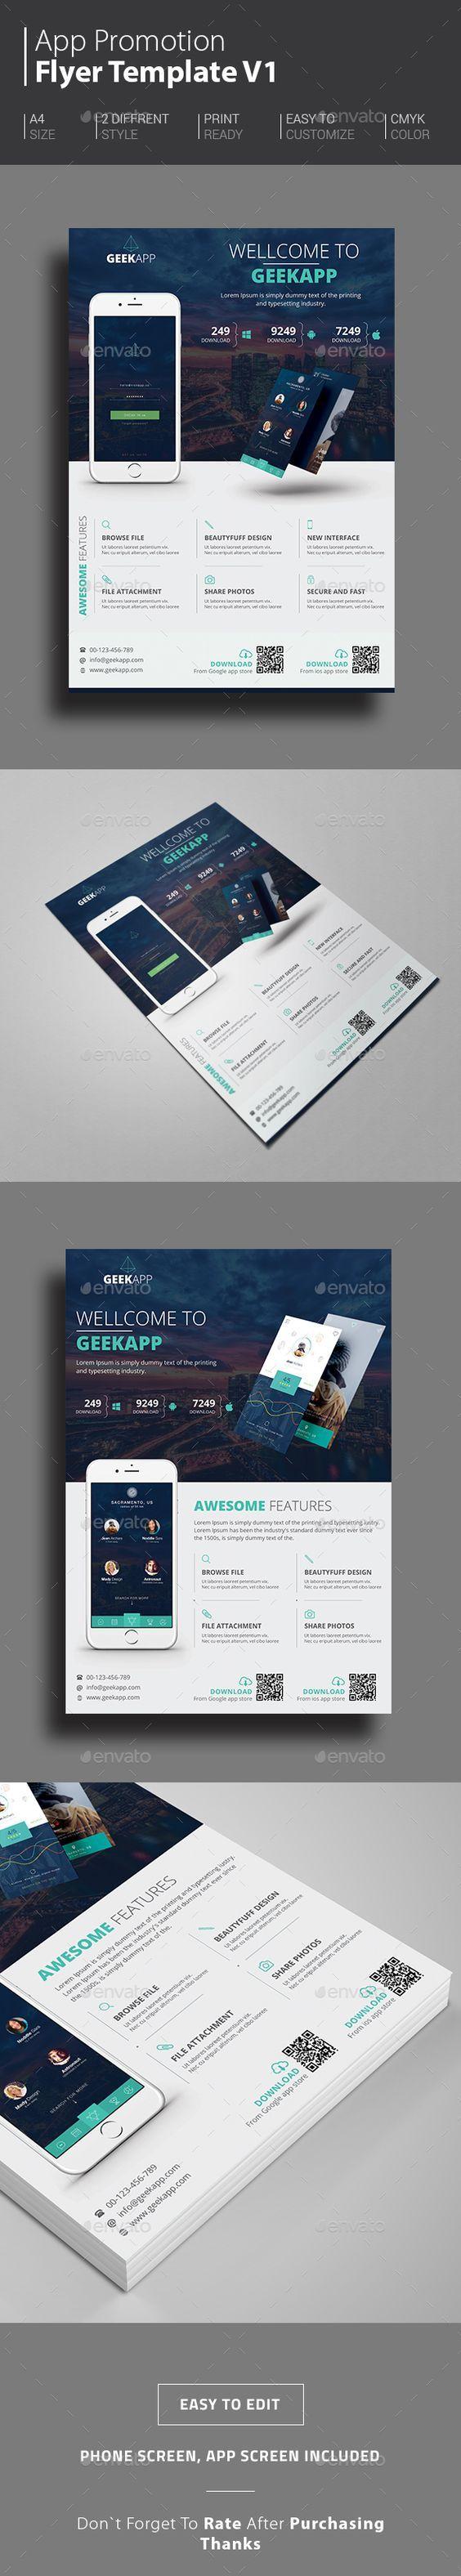 App Flyers Template PSD #design Download: http://graphicriver.net/item/app-flyers/14467216?ref=ksioks: